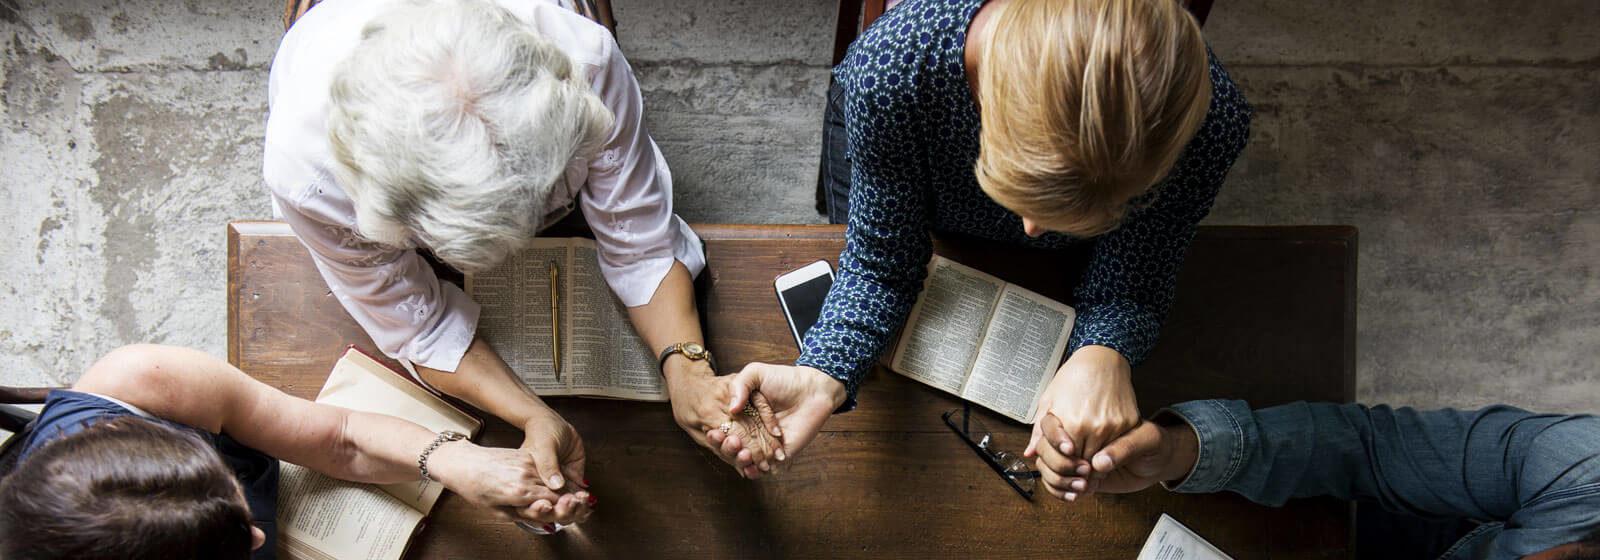 praying intergenerational group at table